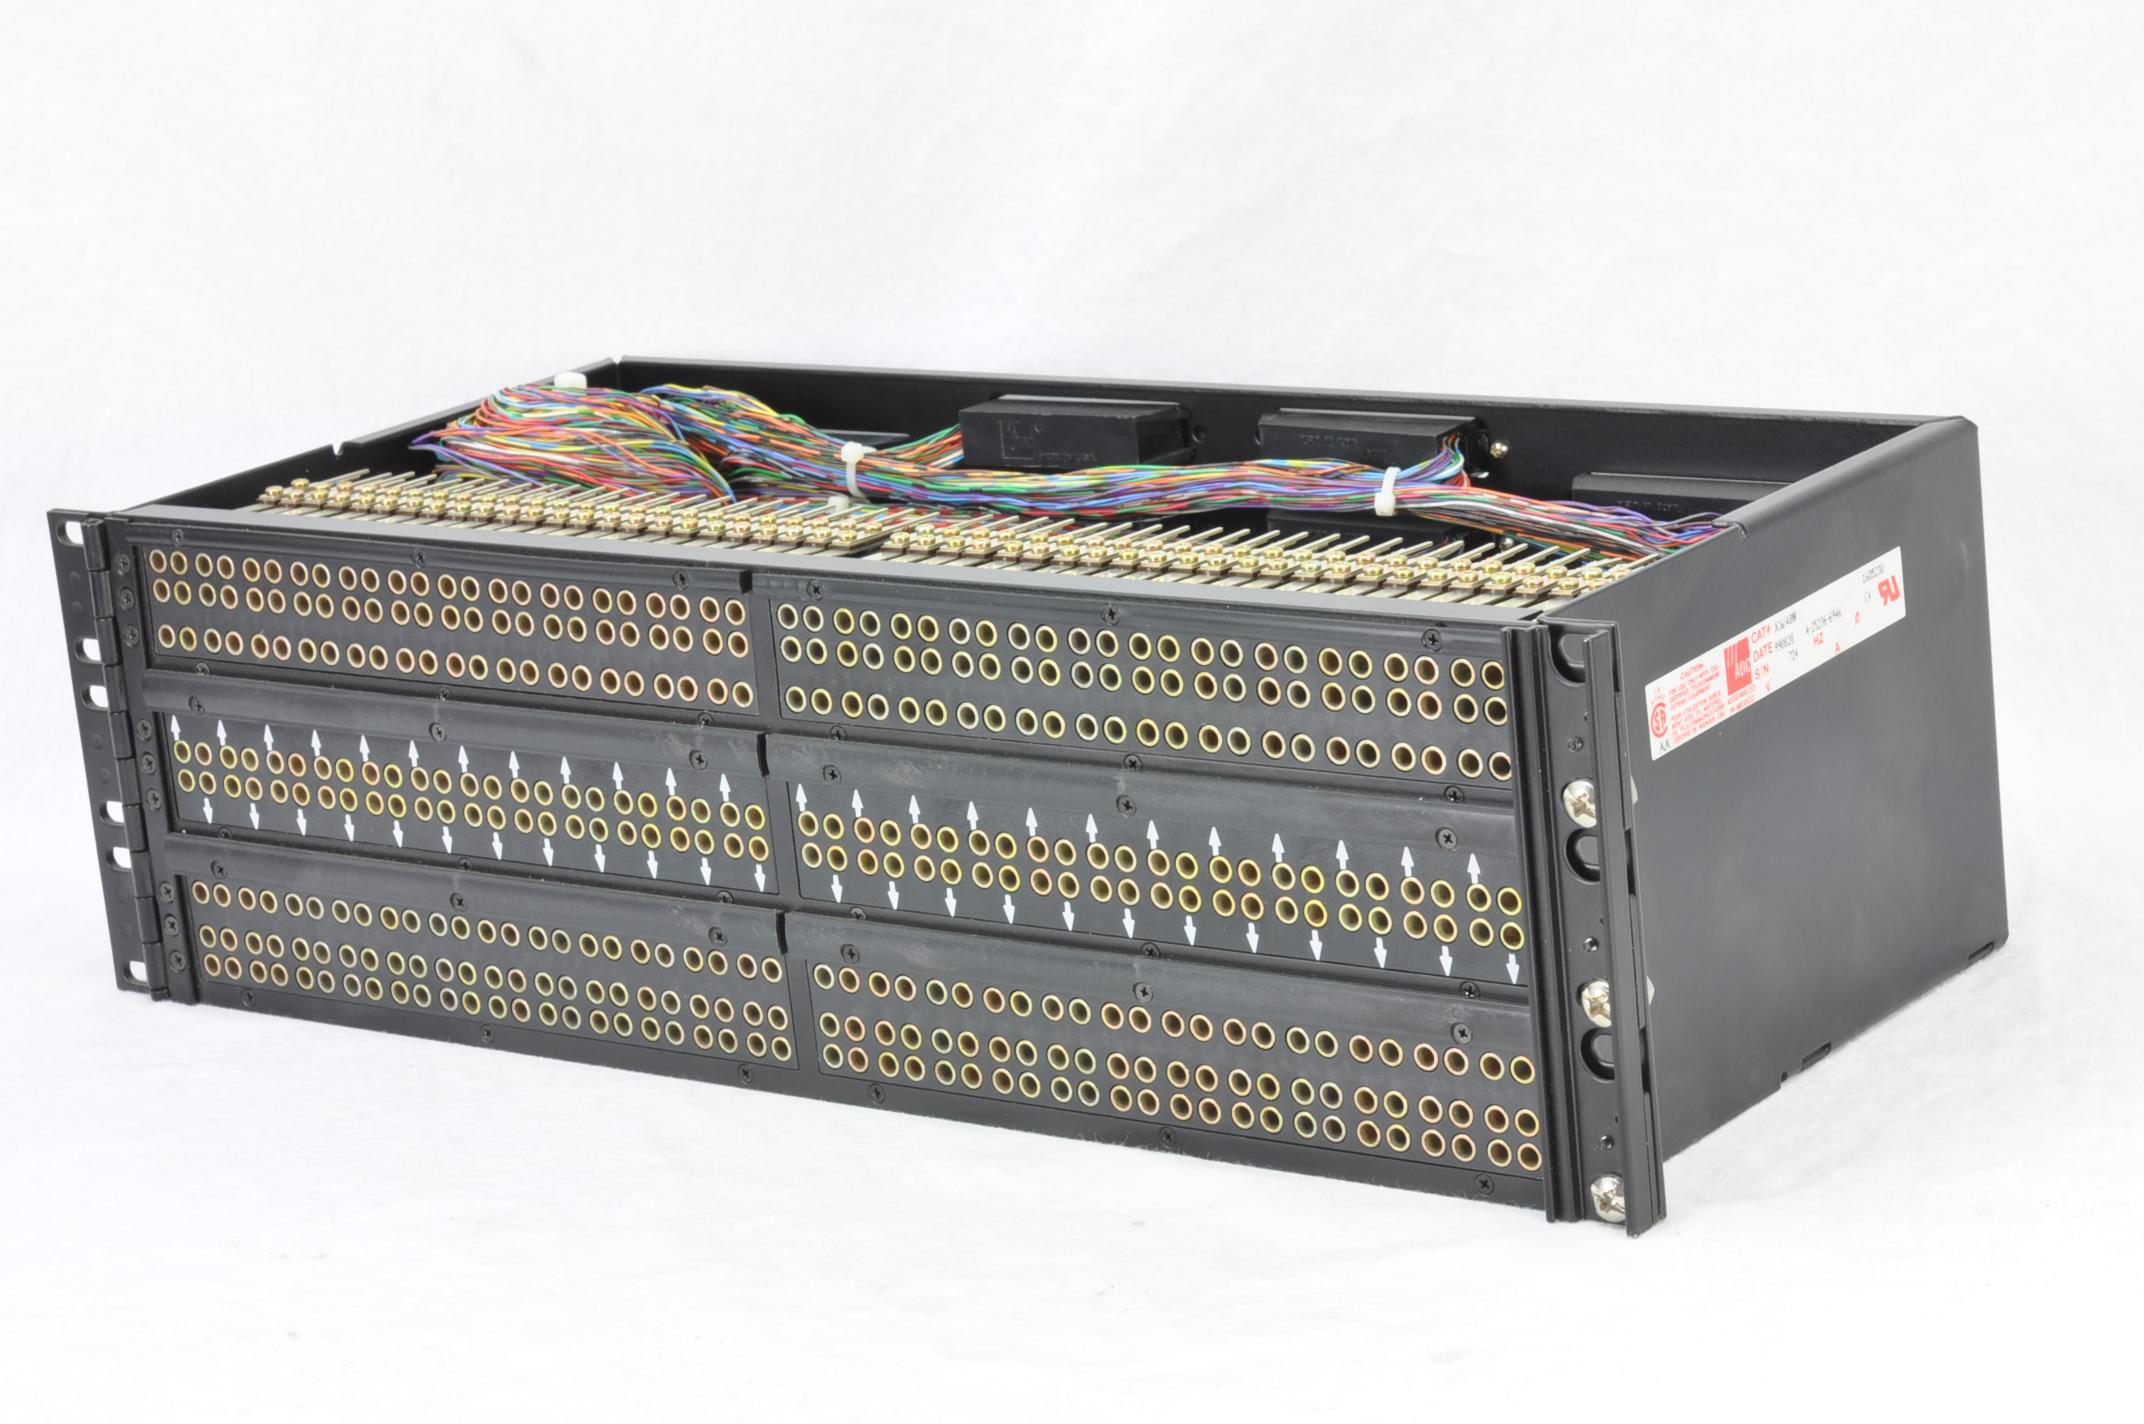 telephone jack rj11 jack wiring diagram adc jc6/48m 6-wire 48-circuit bantam connectorized ... #5